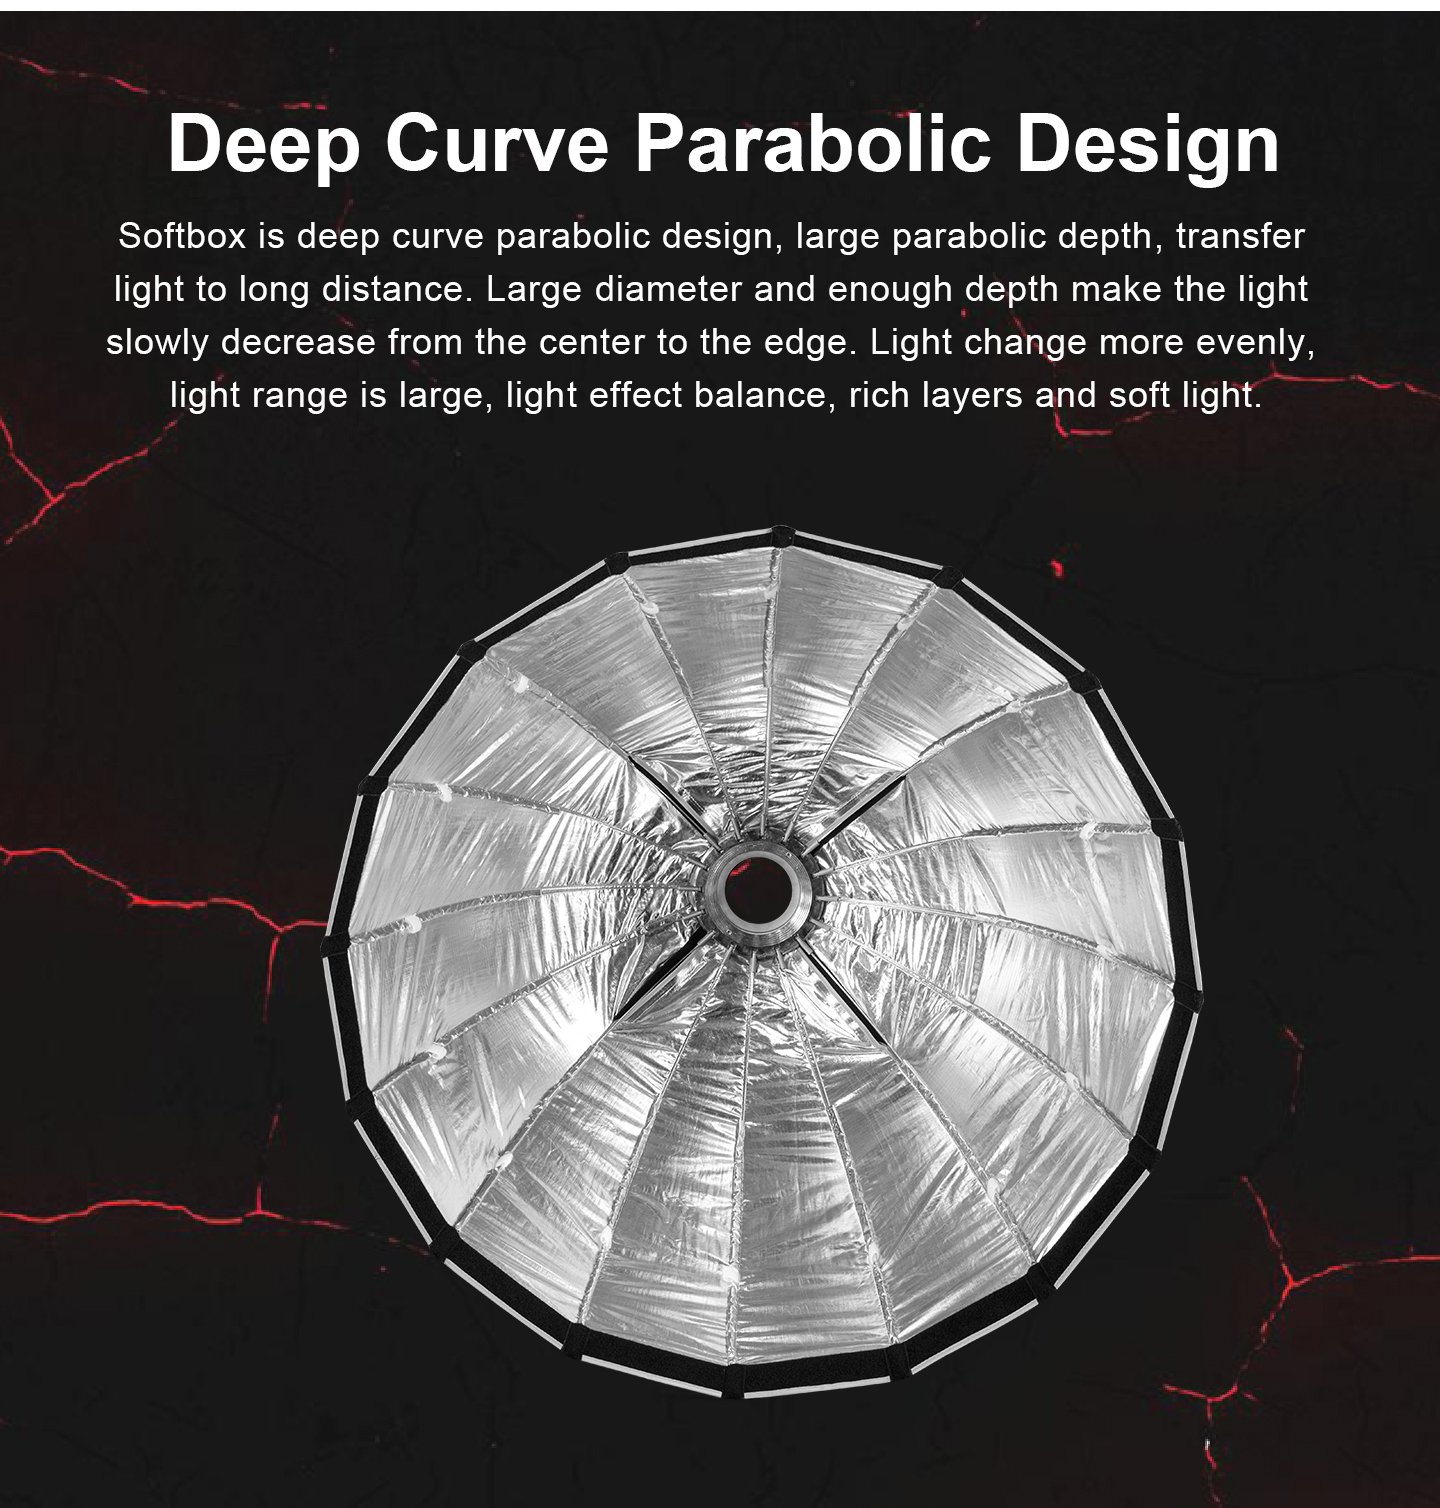 Deep Curve Parabolic Design